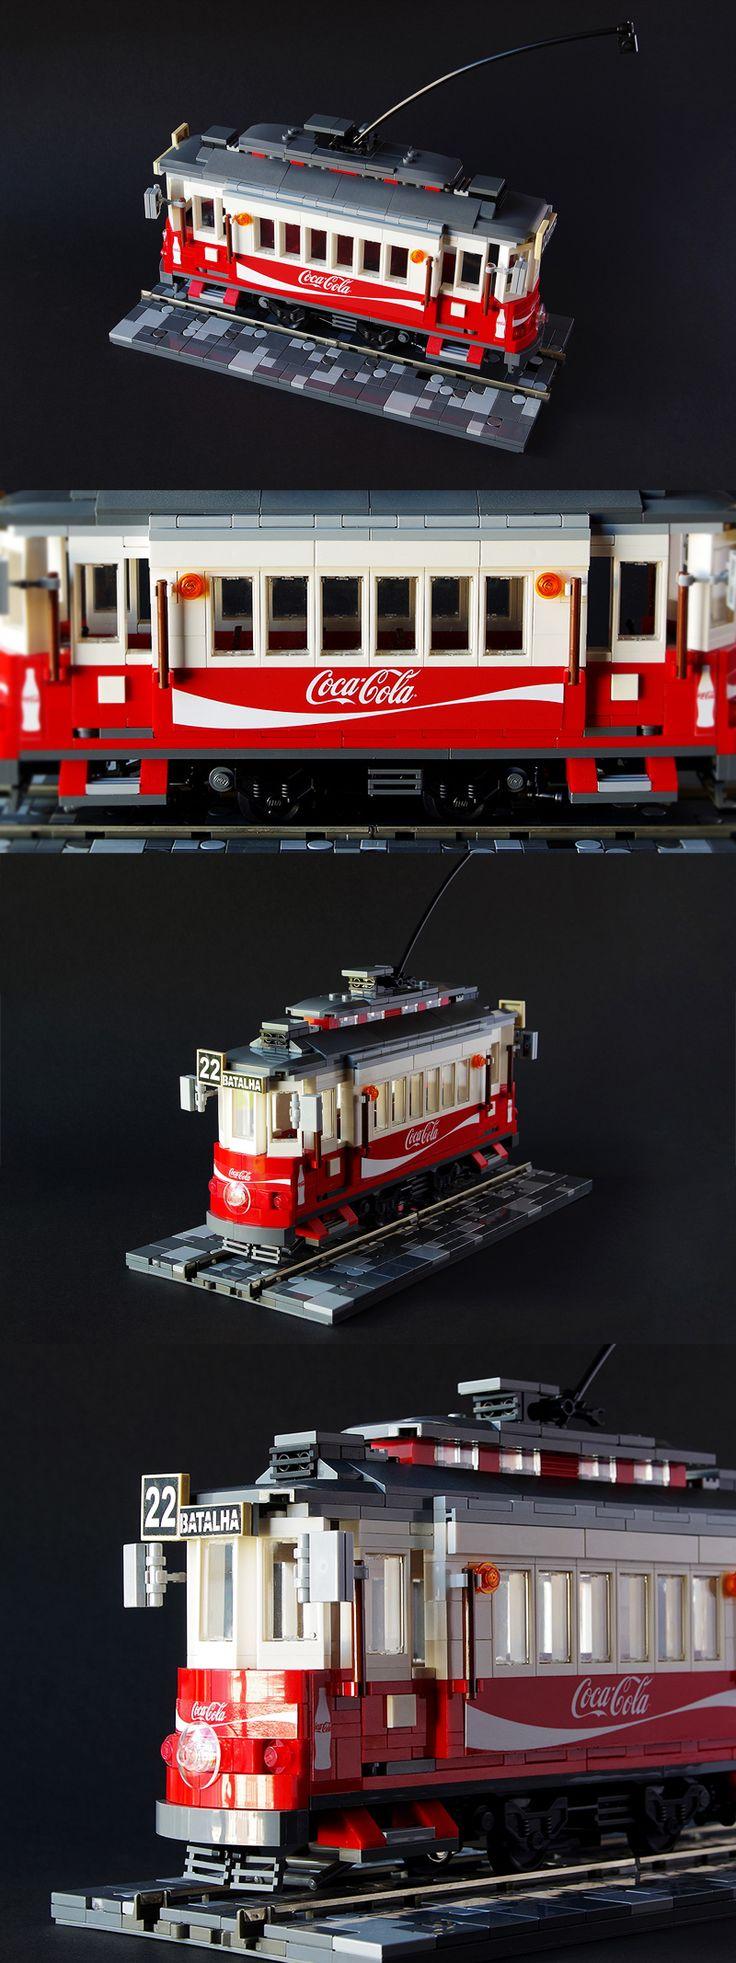 'Eléctrico 22': Porto-style LEGO tram car by 'rupilego'